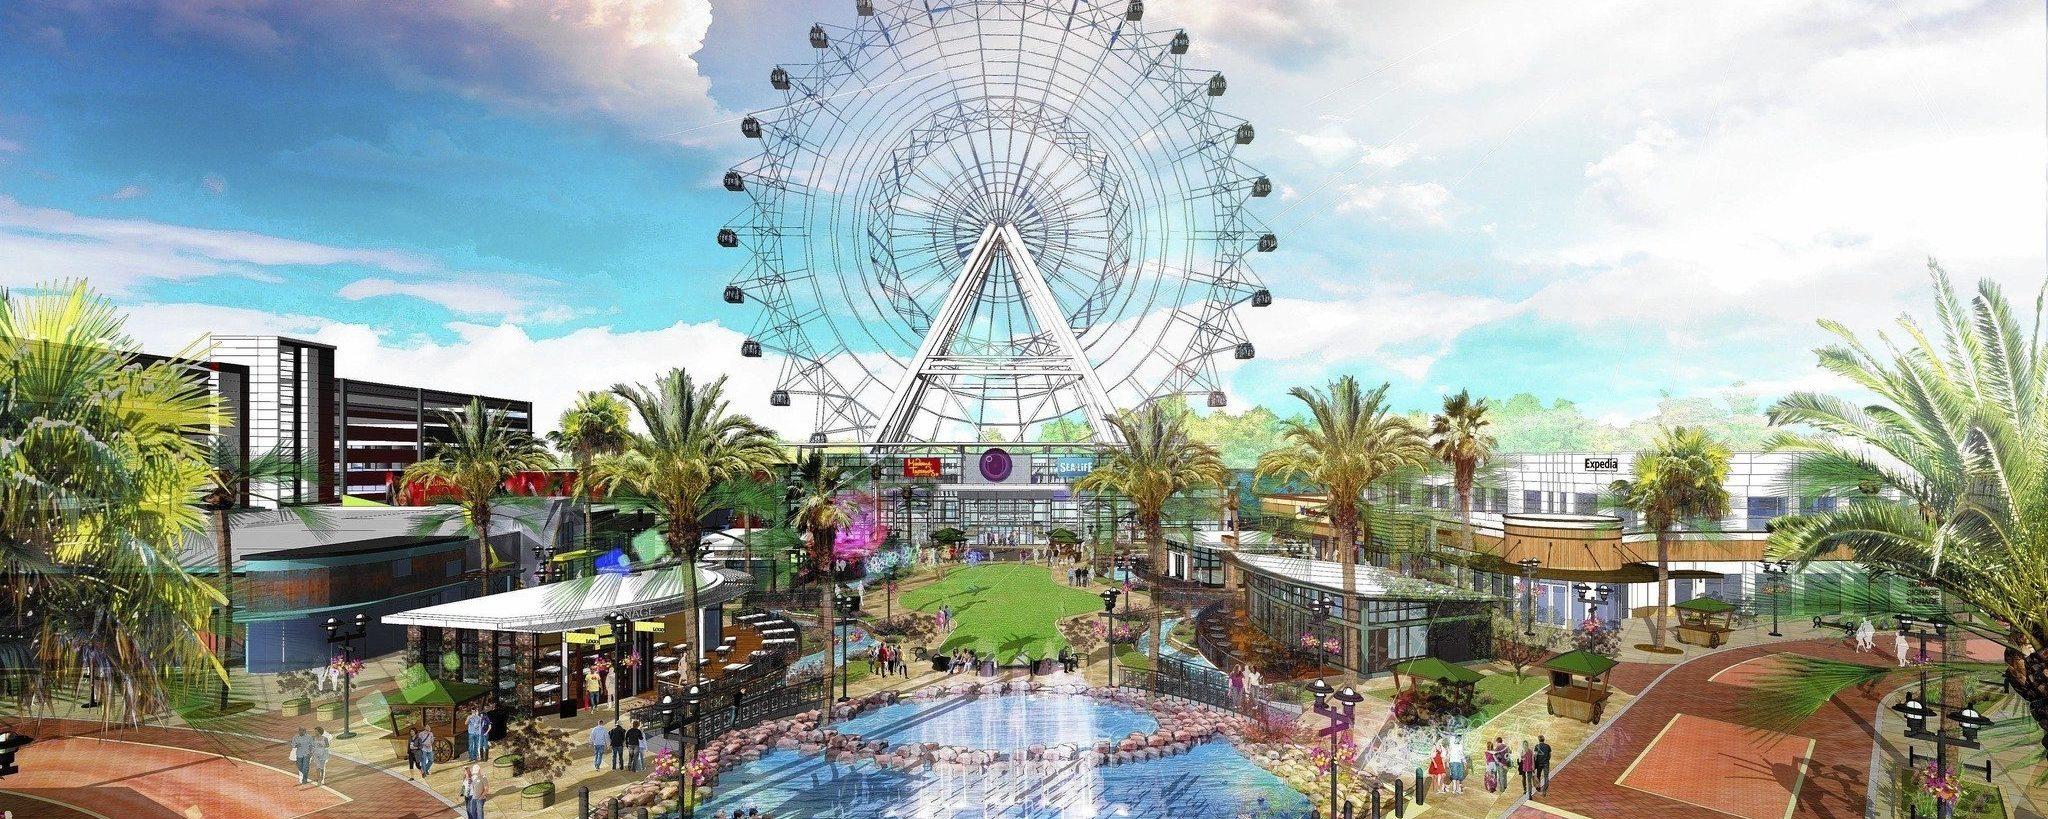 Conheça o ICON Park: Orlando Eye, Madame Tussauds e Sea Life